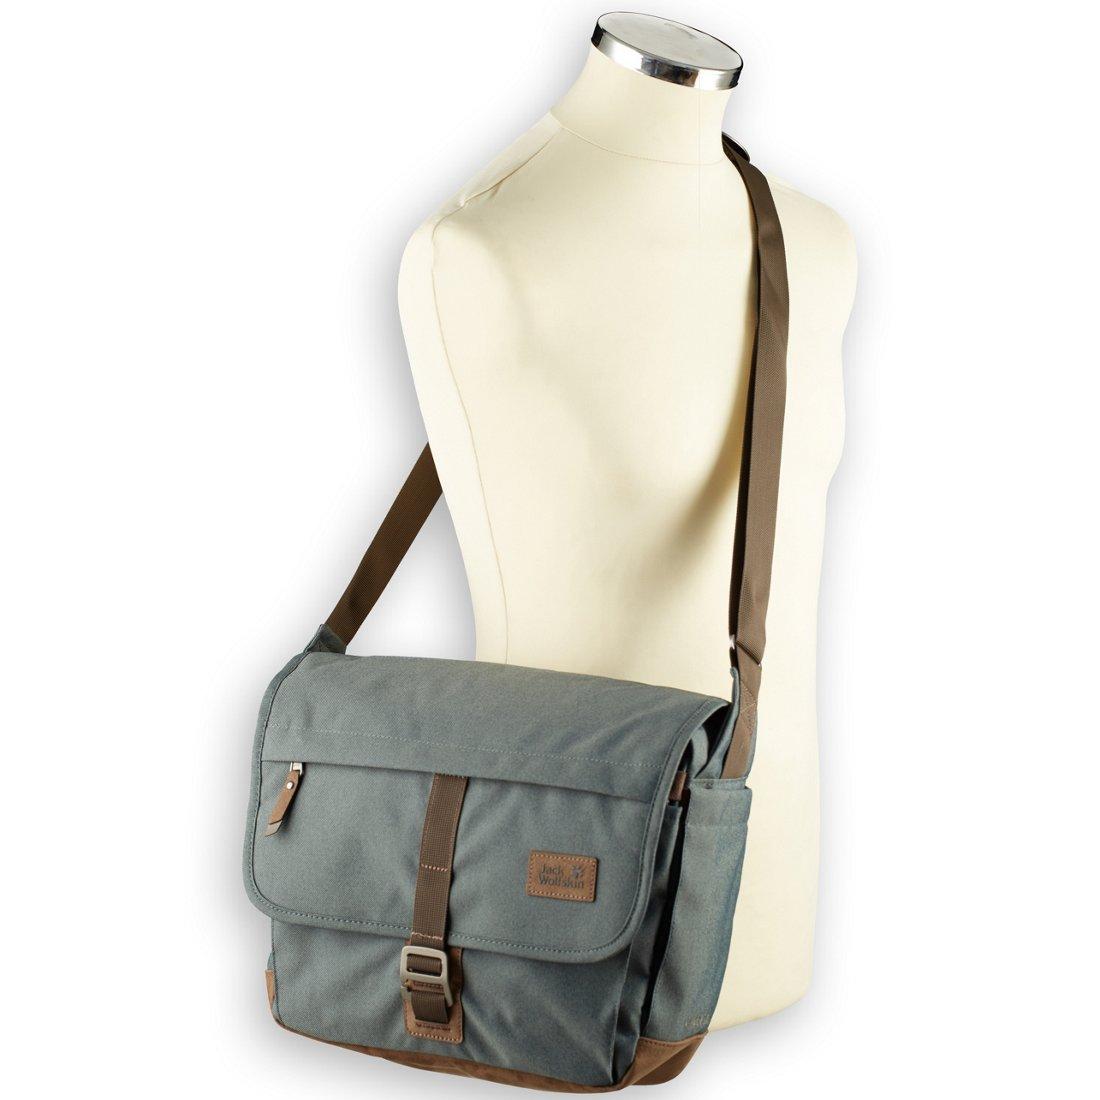 kup tanio odebrane sprzedaje Jack Wolfskin Daypacks & Bags Camden Town Umhängetasche 37 cm - greenish  grey